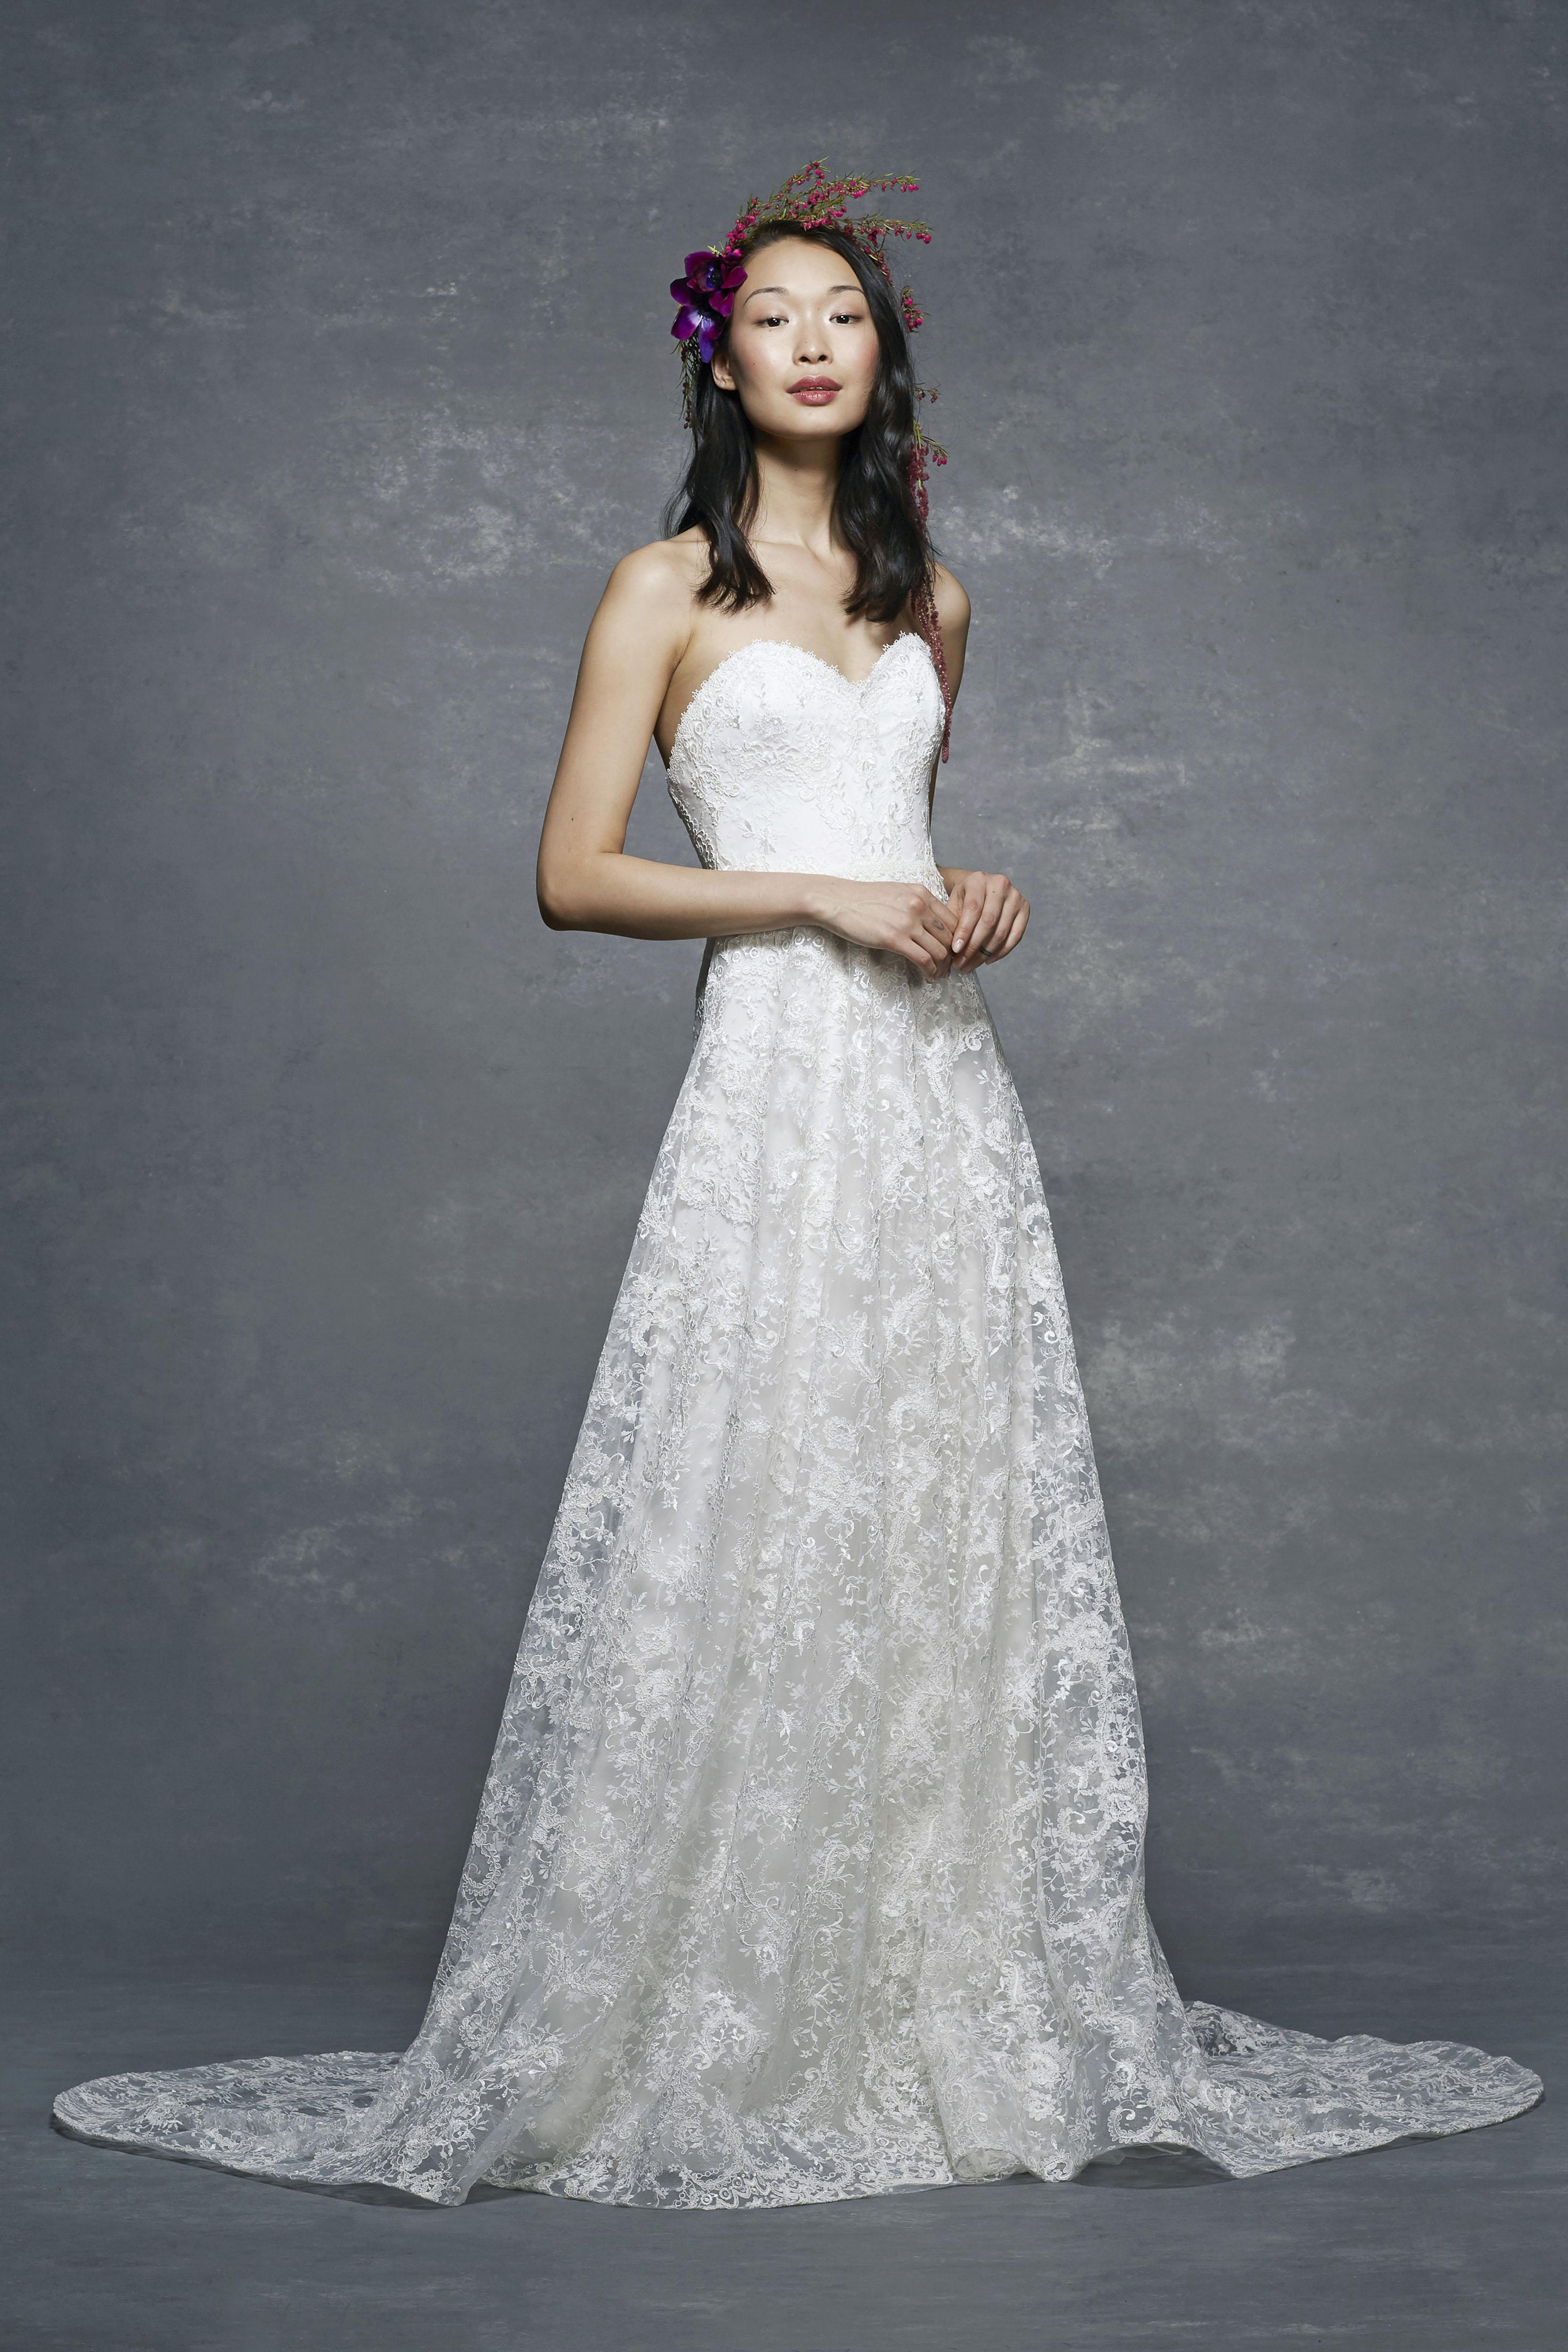 marchesa notte bridal wedding dress sweetheart a-line